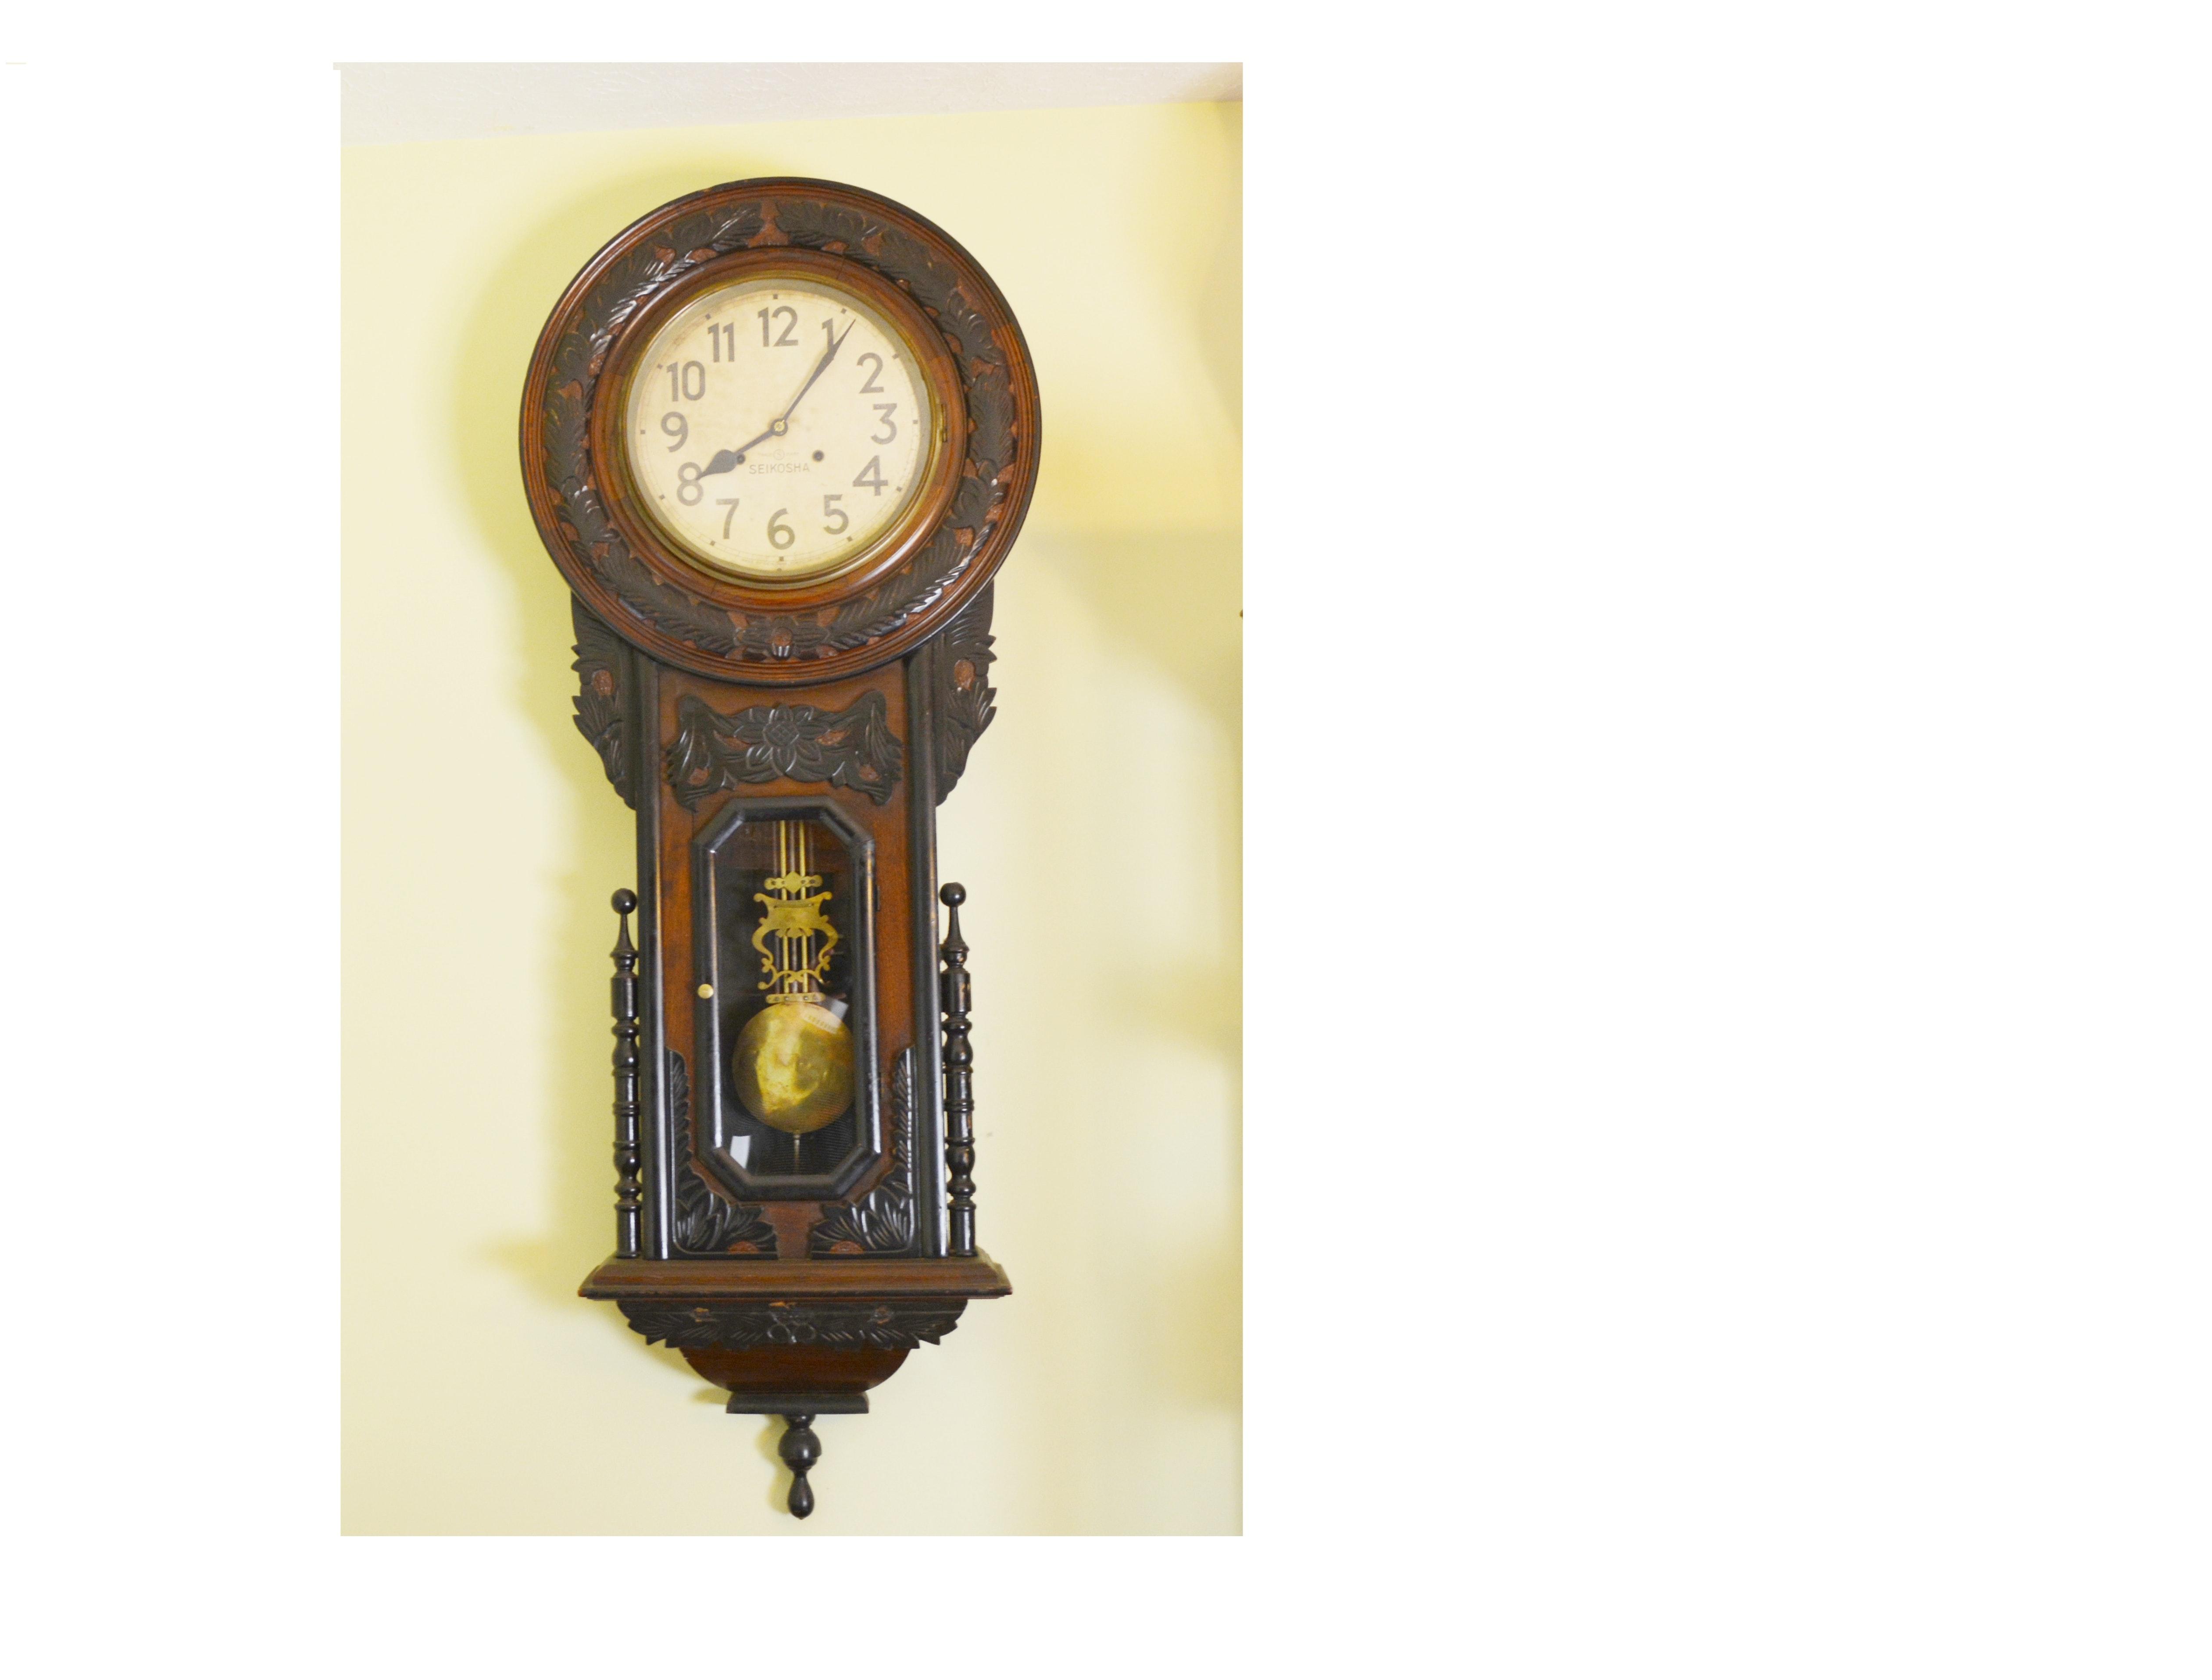 Antique Japanese Seikosha Wall Clock